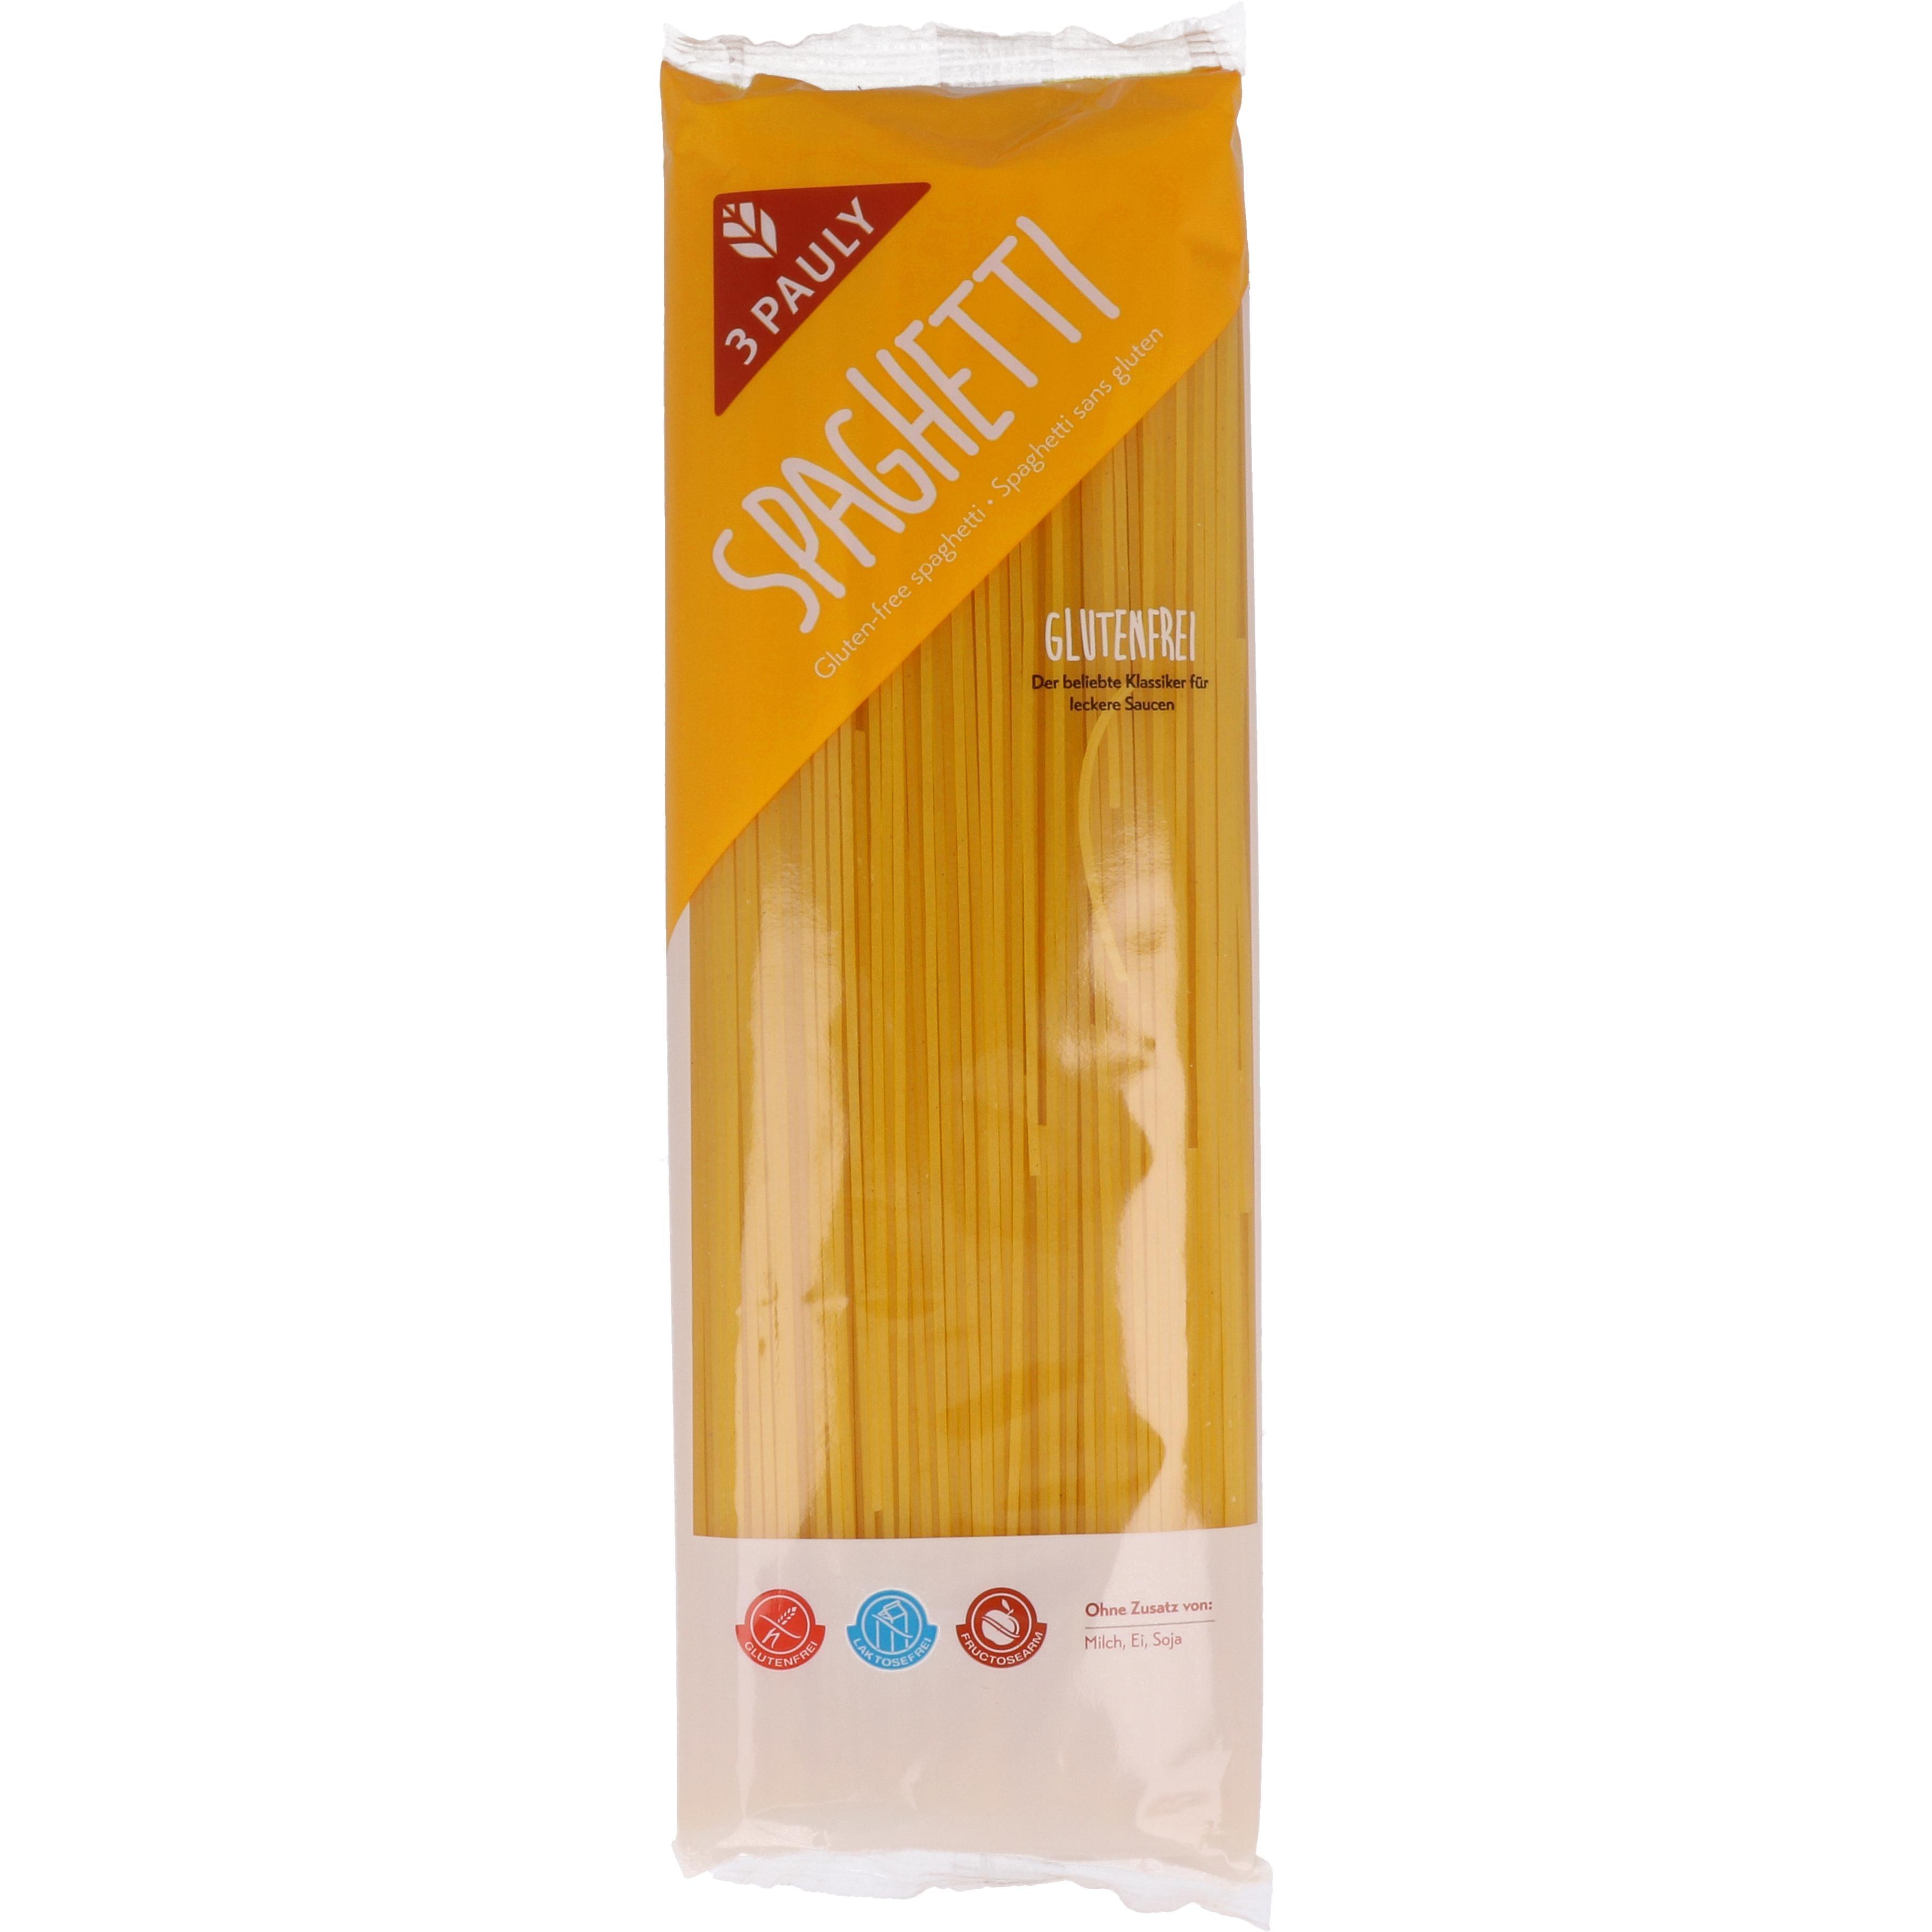 3 Pauly Spaghetti 500g